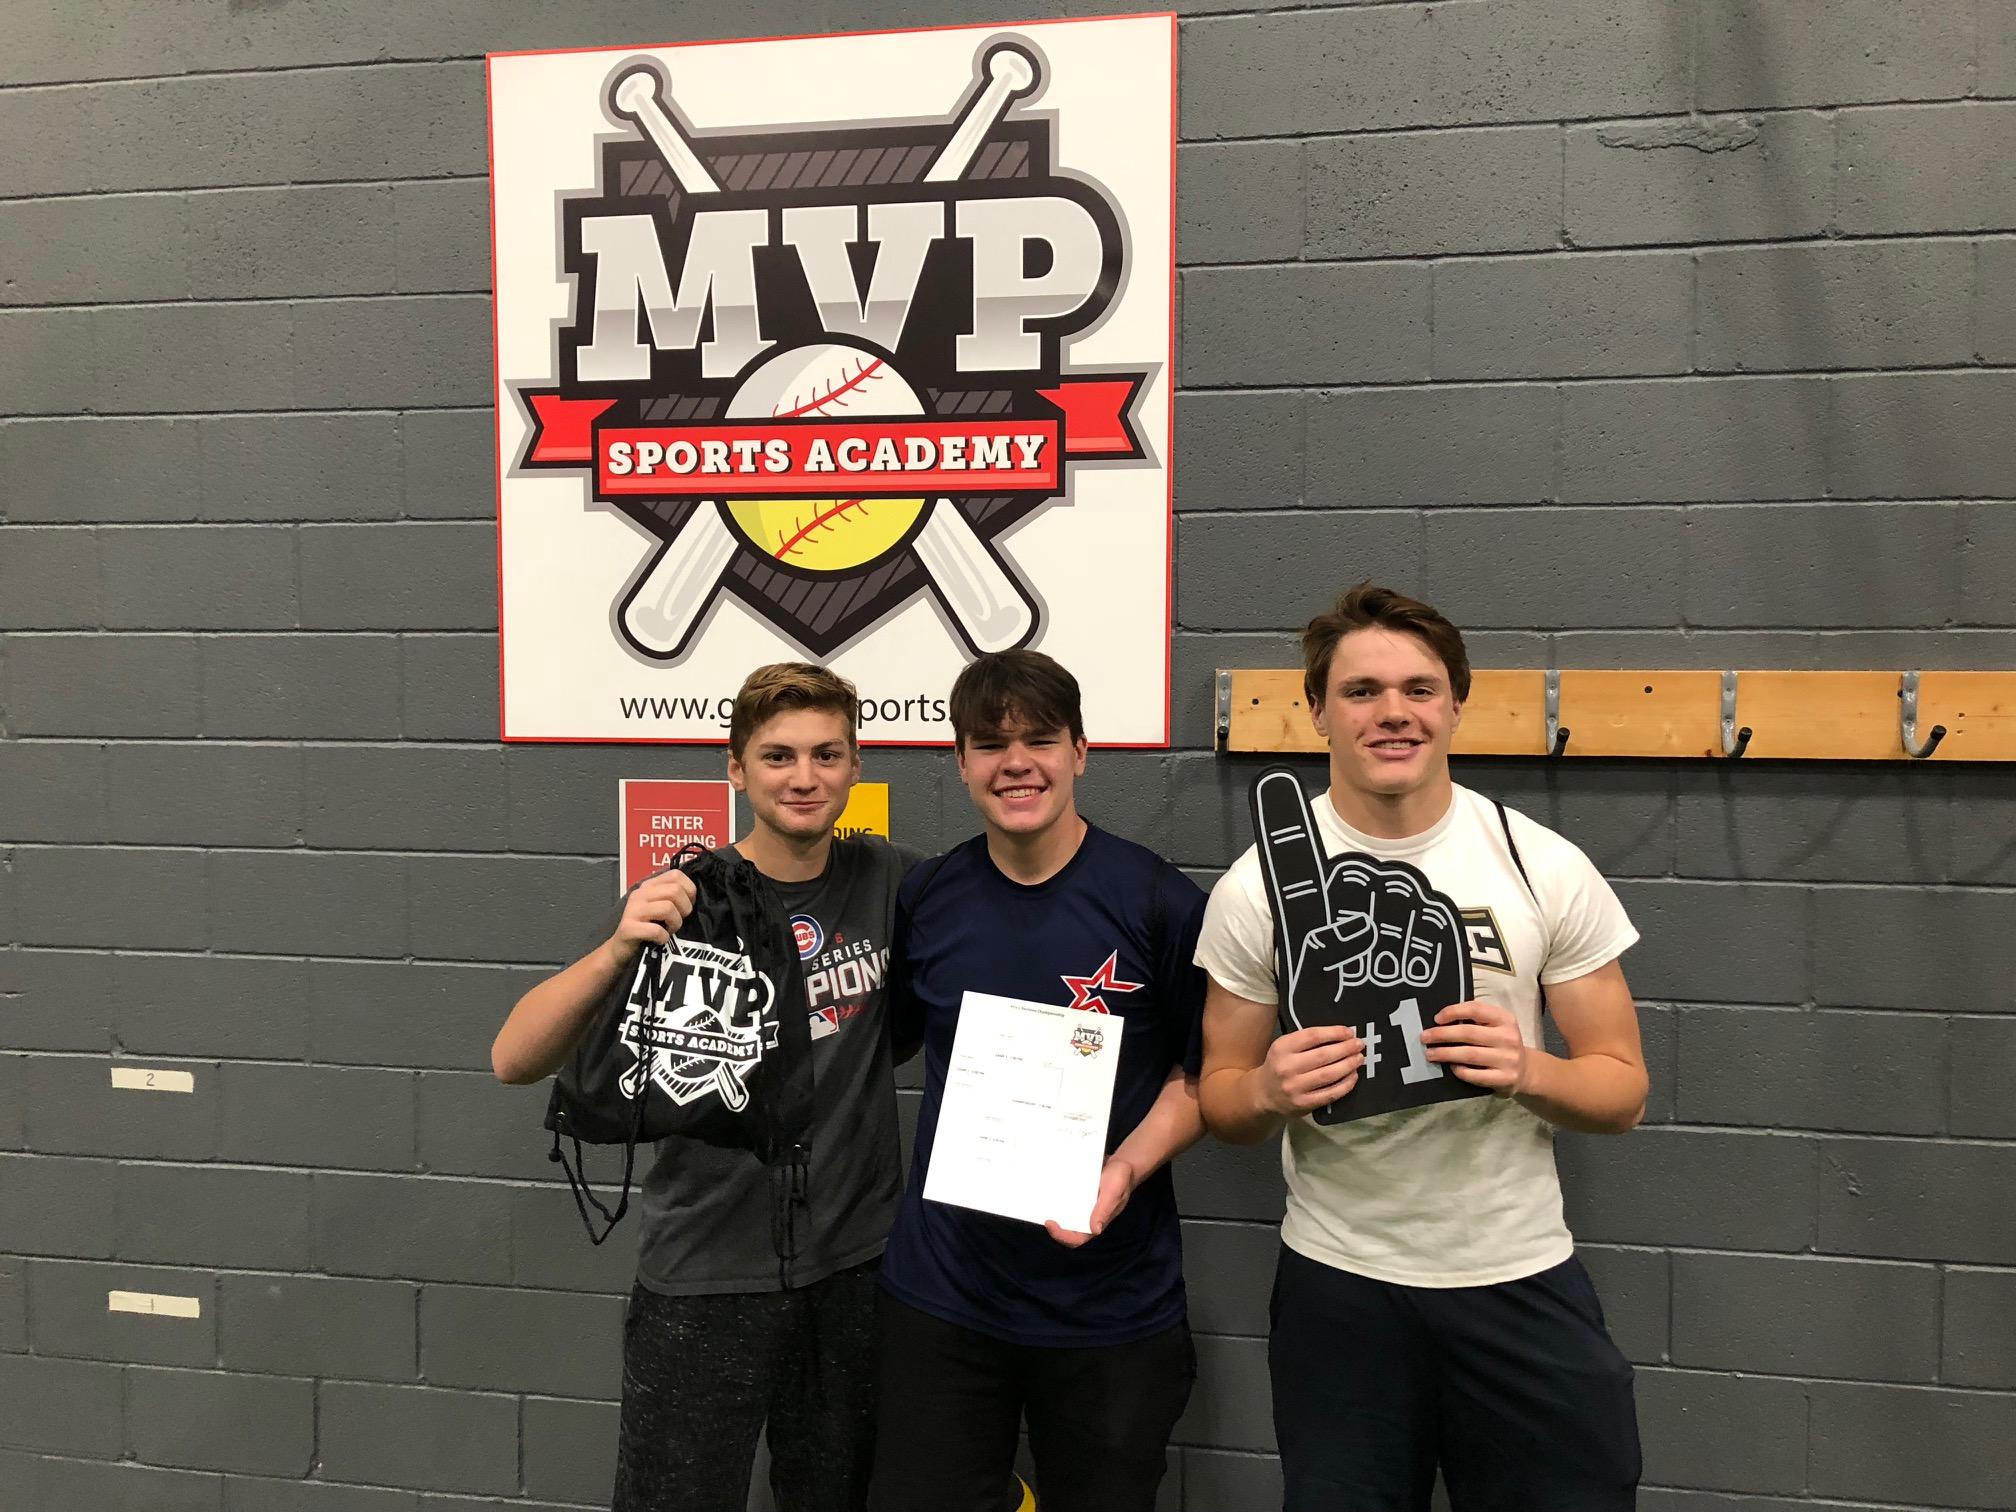 Fall League 2018 HitTrax Winners - Pro Division (High School)